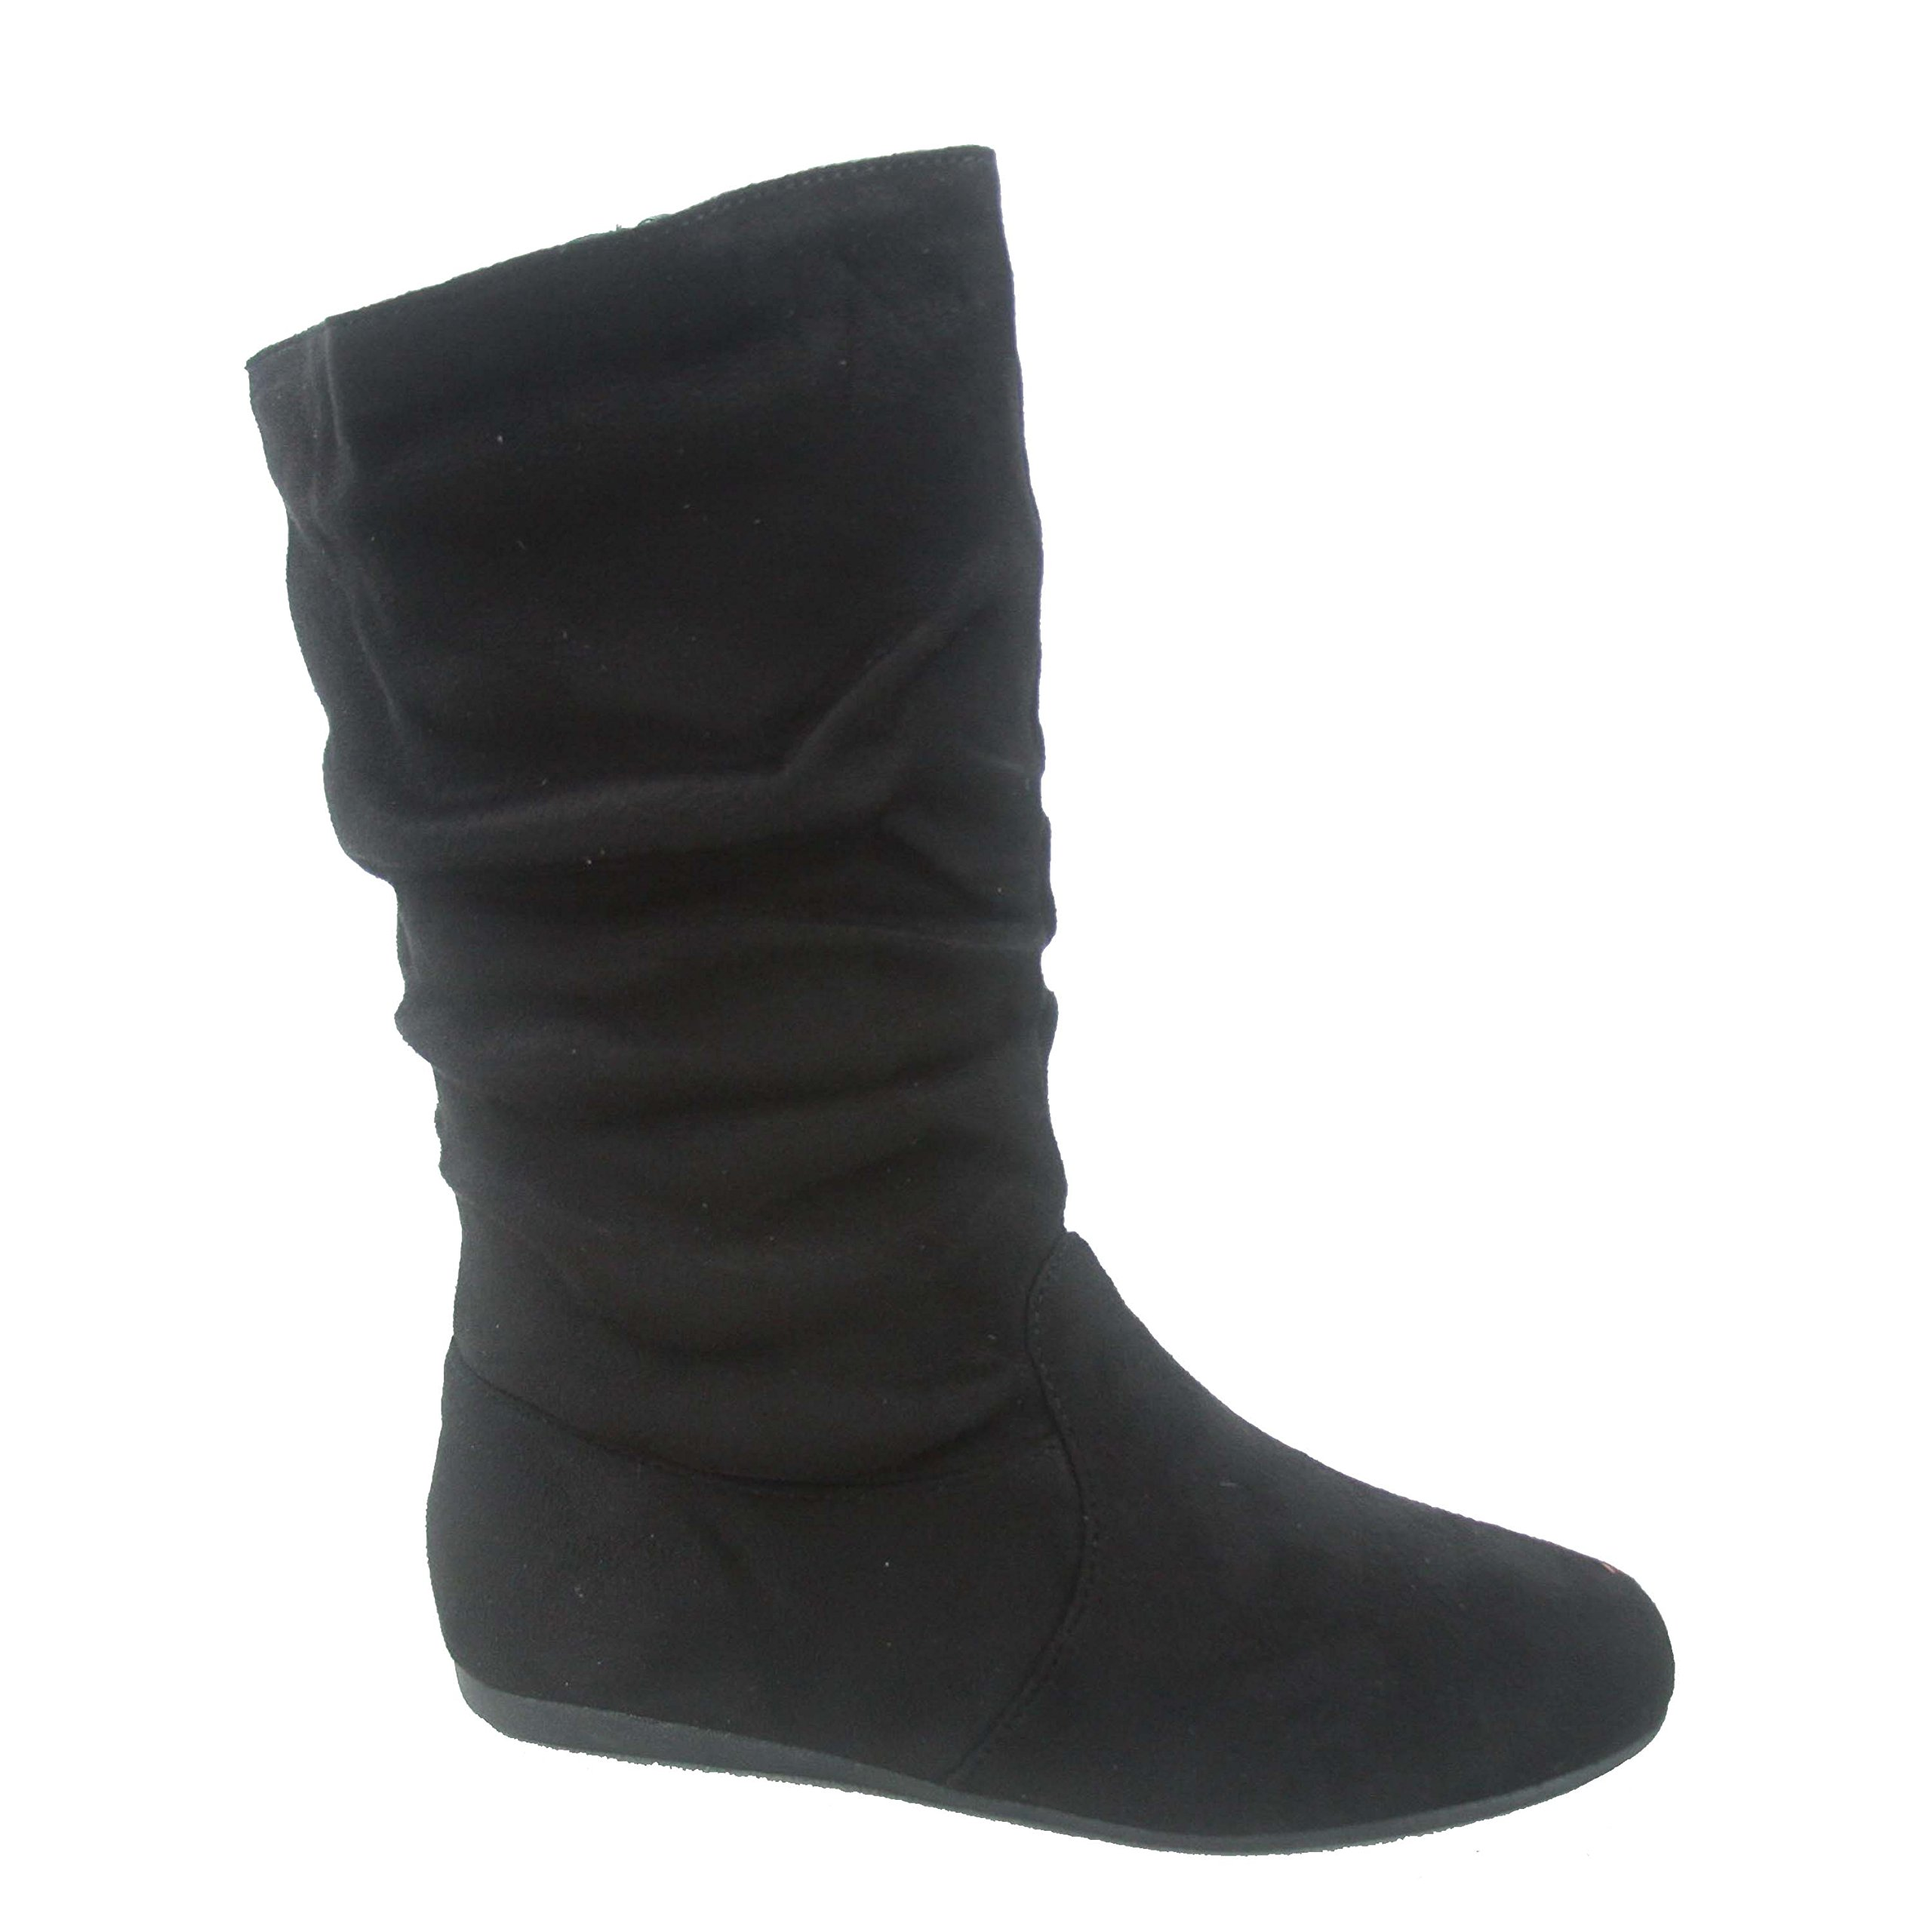 Forever Link Selena-23k Girl's Kid's Cute Causal Zipper Mid Calf Slouchy Flat Boot Shoes (13 B(M) US, Black)